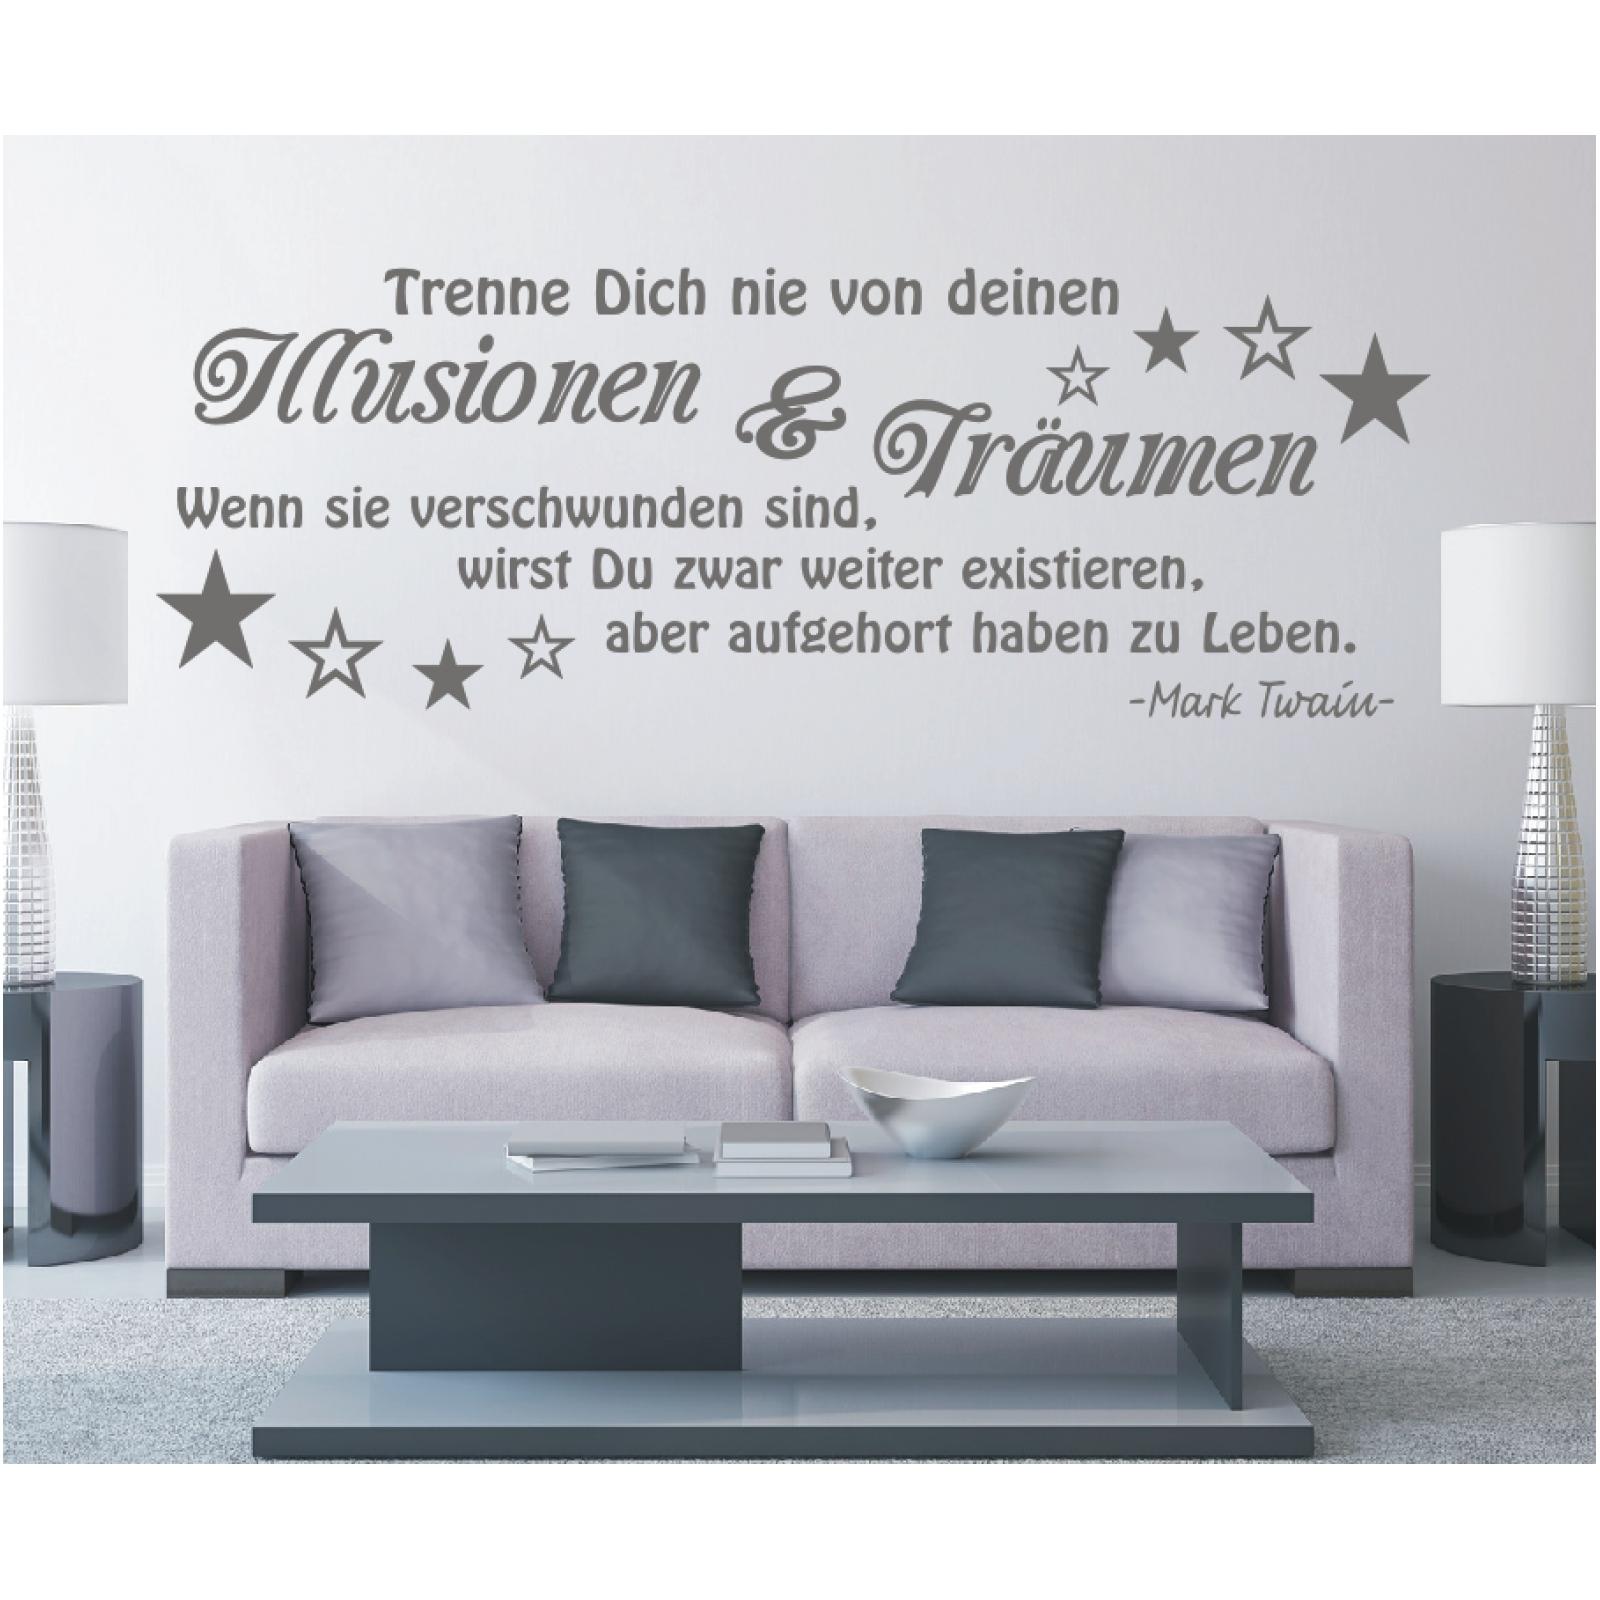 Wandtattoo-Spruch-Illusionen-Traeumen-Leben-Twain-Zitat-Wandaufkleber-Sticker-9 Indexbild 3